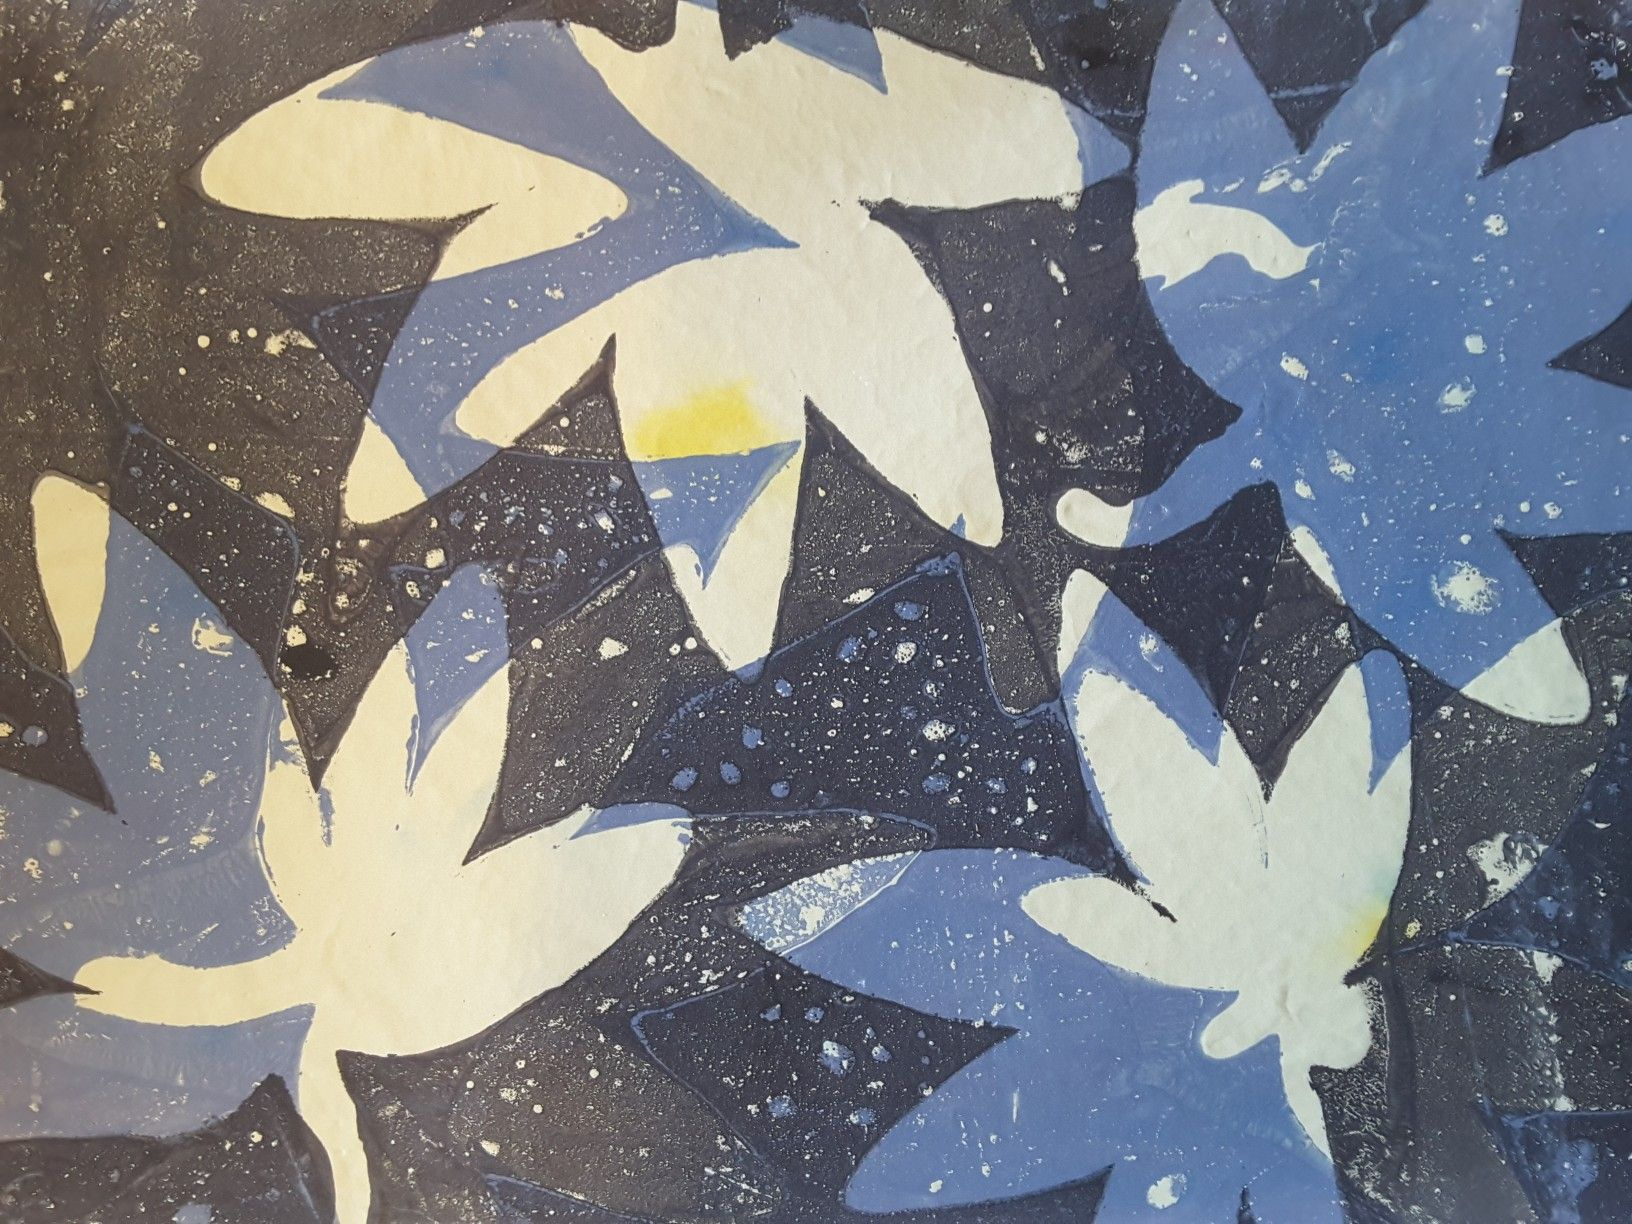 Janelle Patchett Original Art